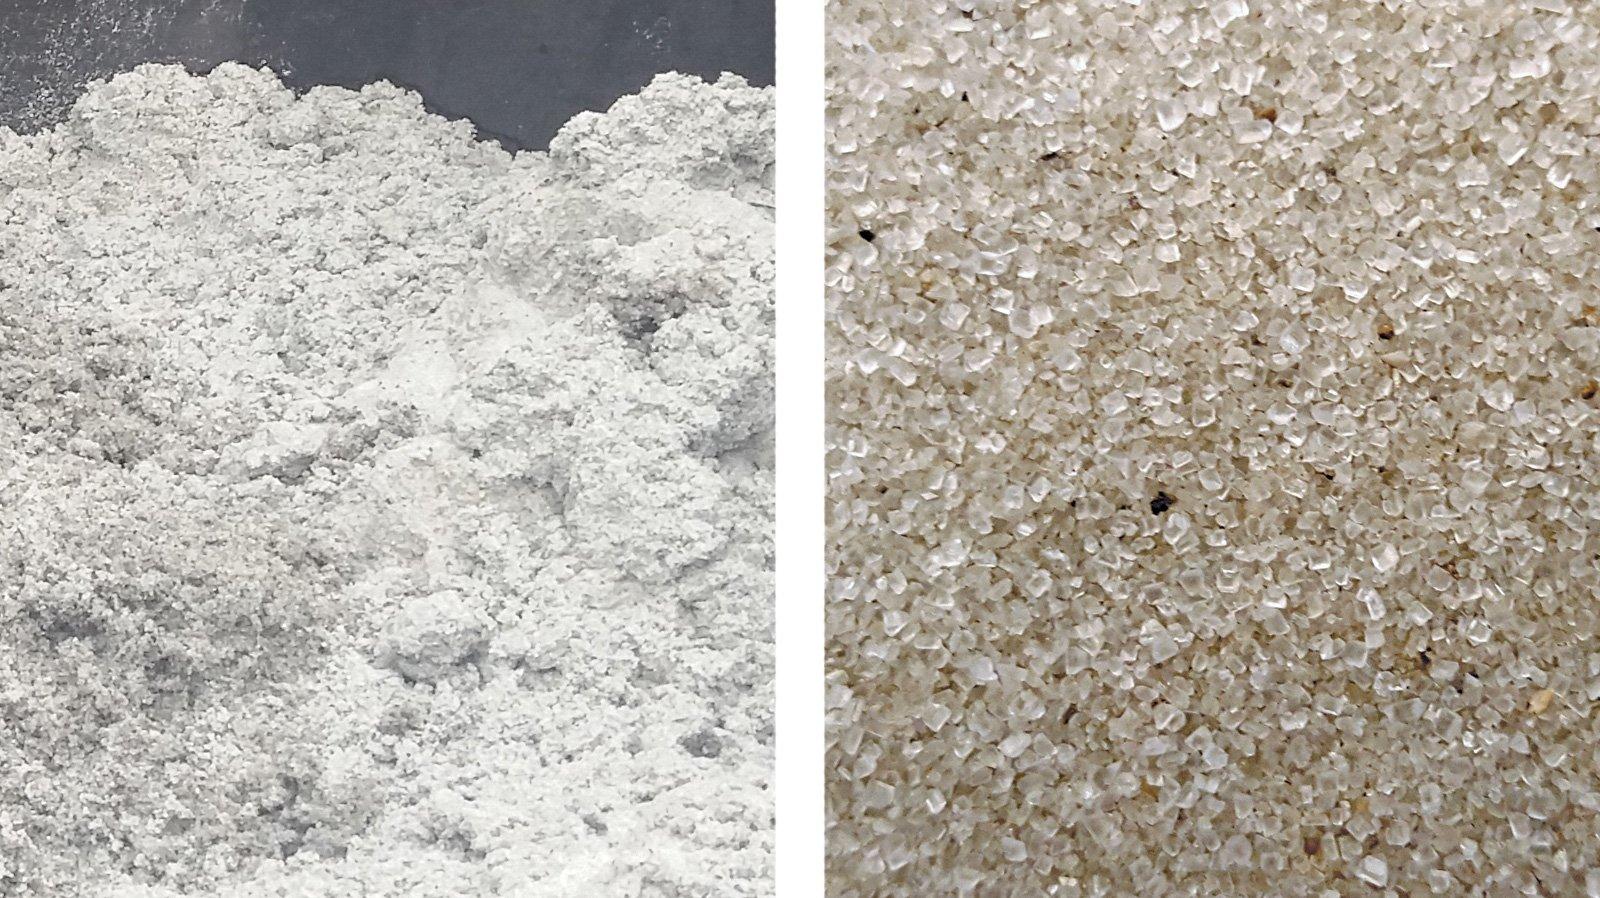 Photos of struvite, a mineral consisting of magnesium, ammonium and phosphorus.